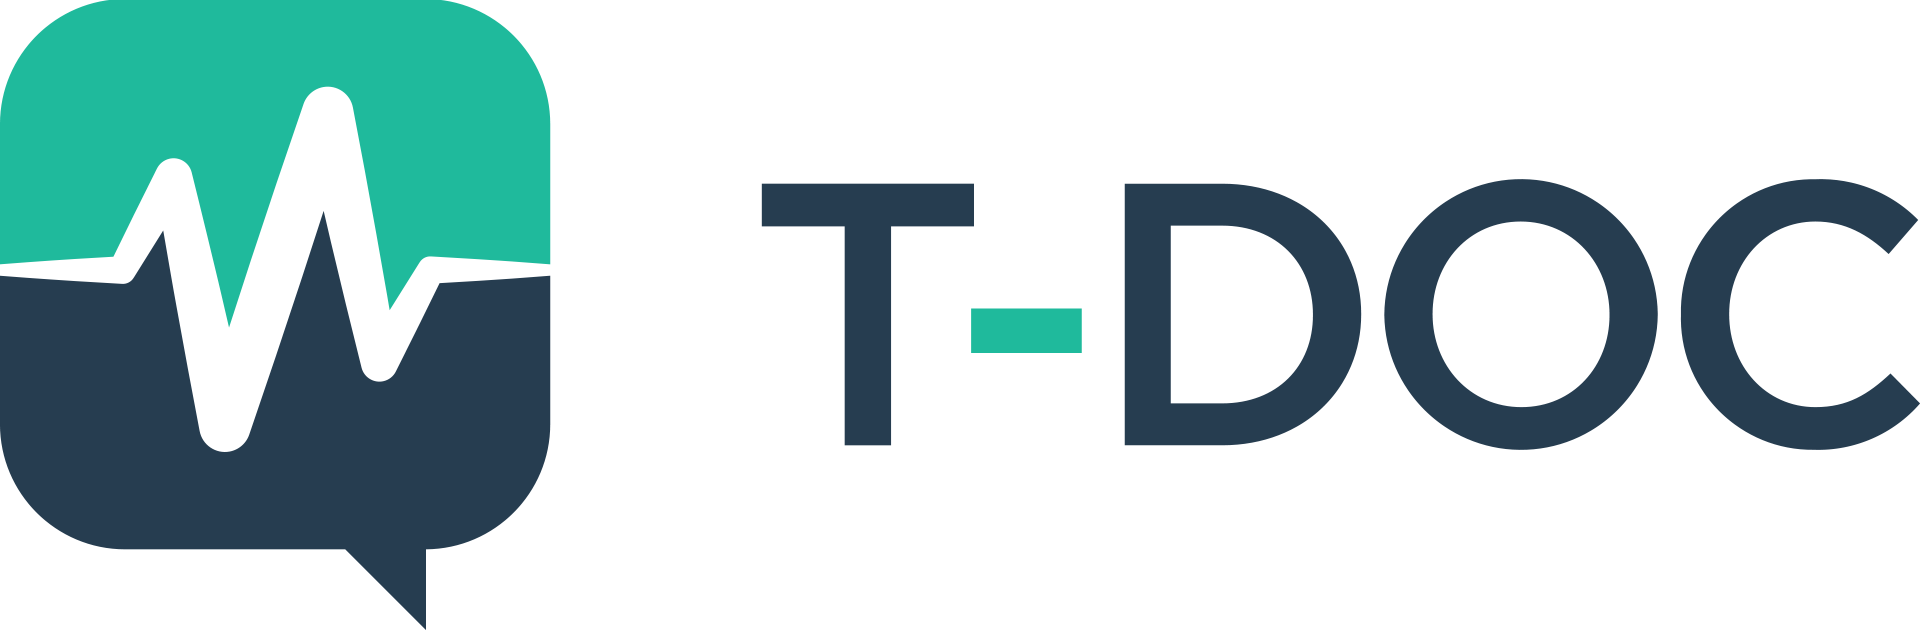 ArenimTel - Referenciák - T-Doc